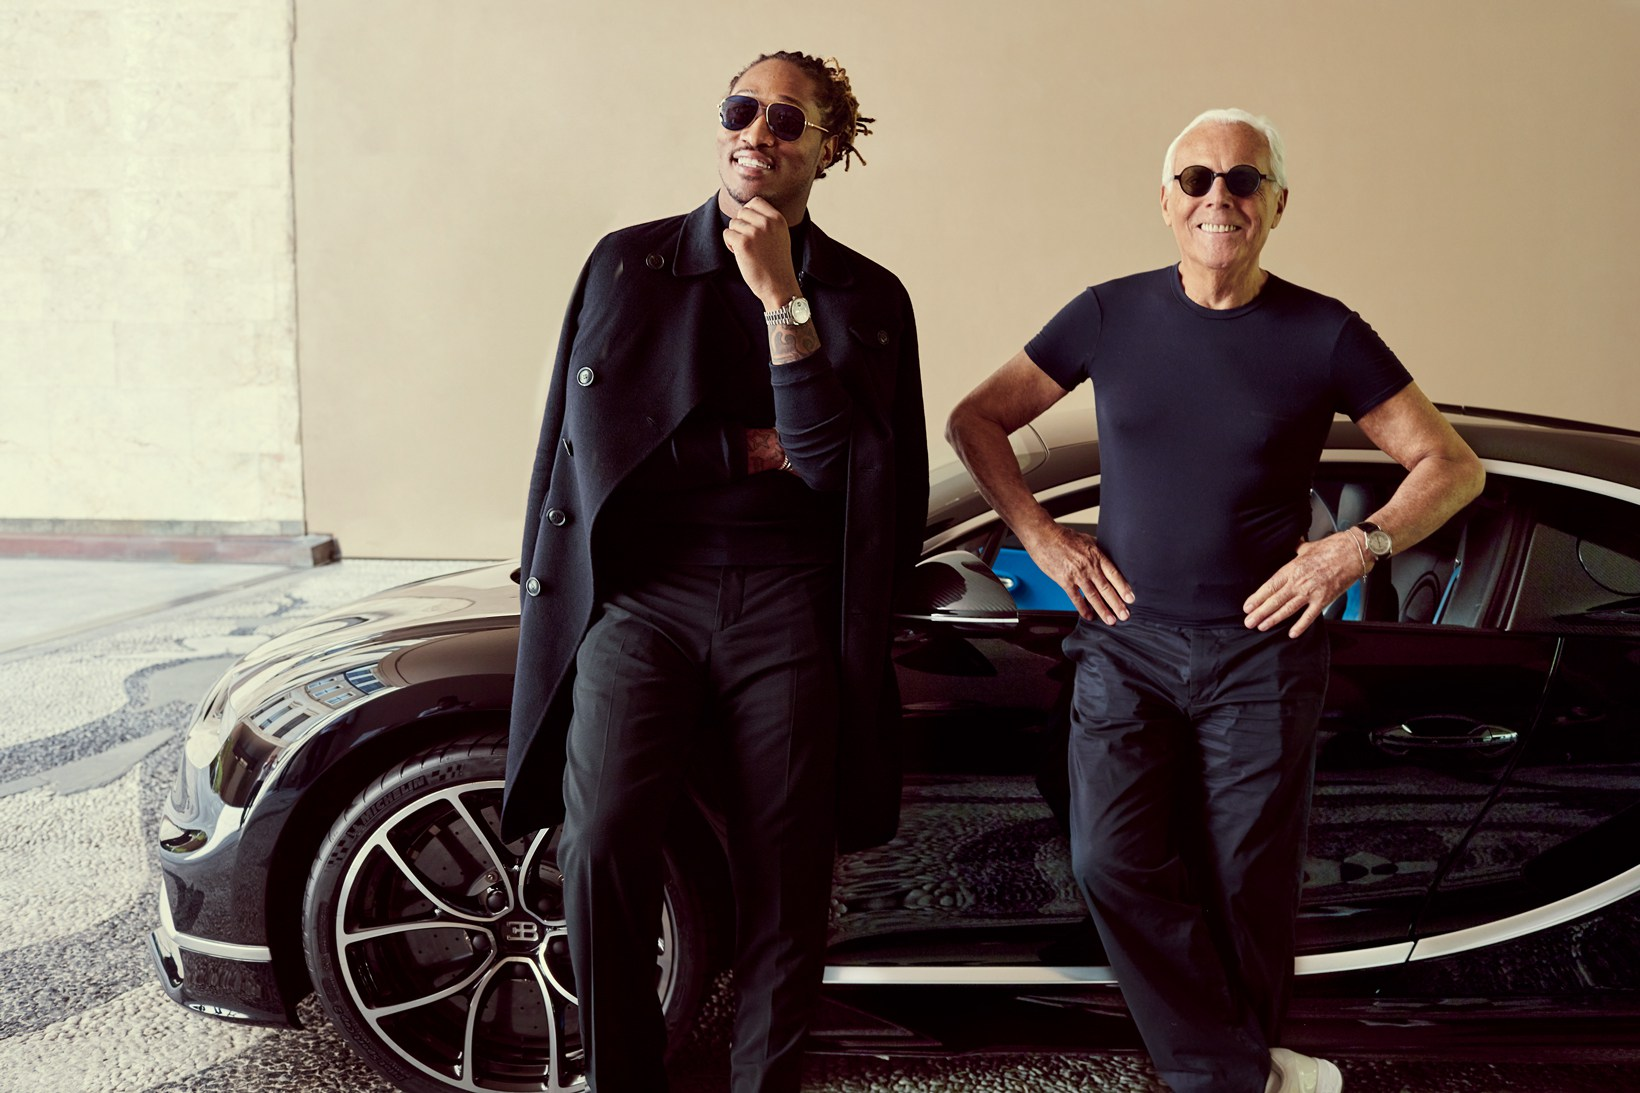 Future, Bugatti and Armani Work on a First Time Collaboration